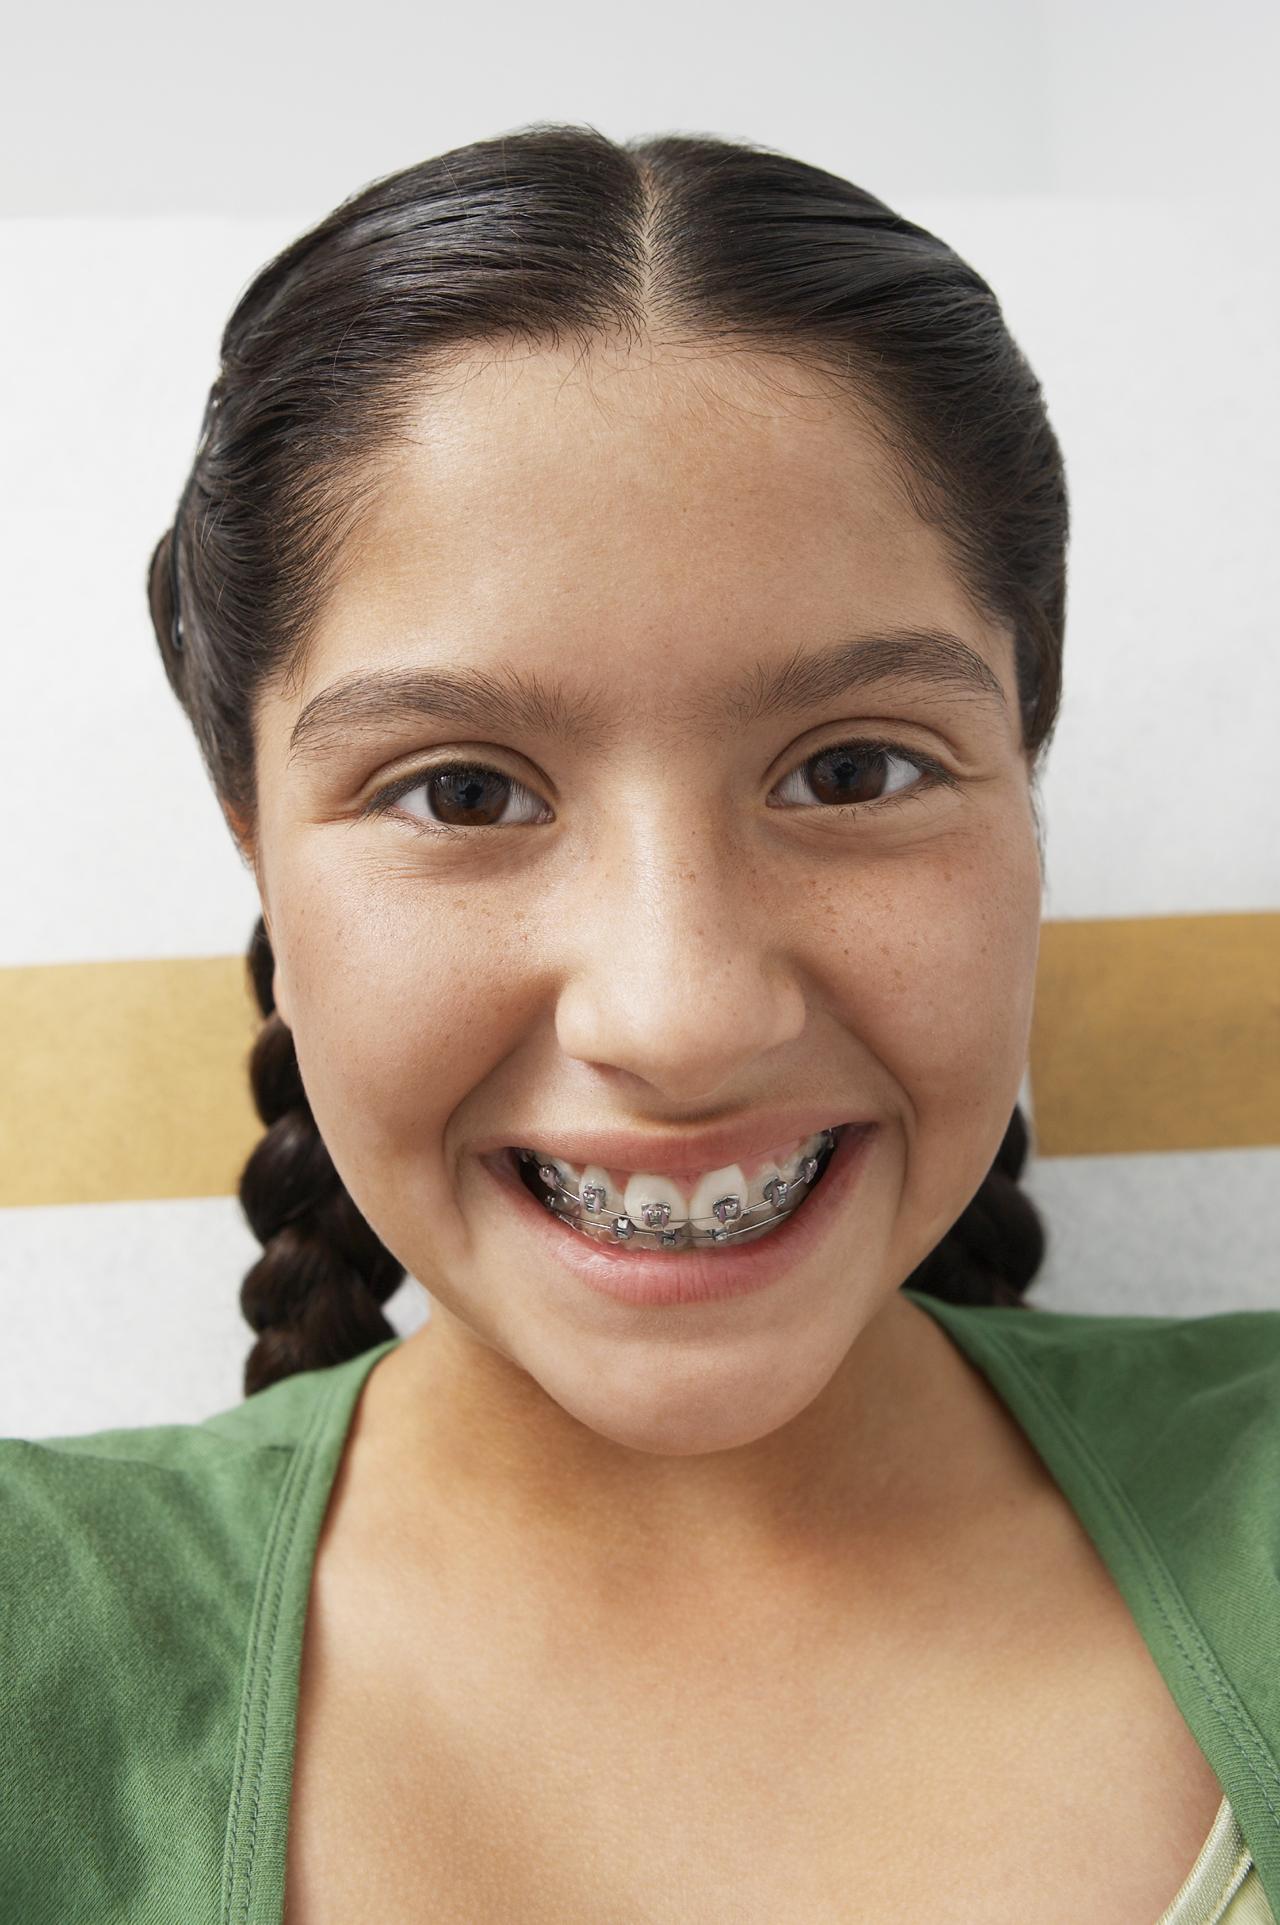 Orthodontic Elastics